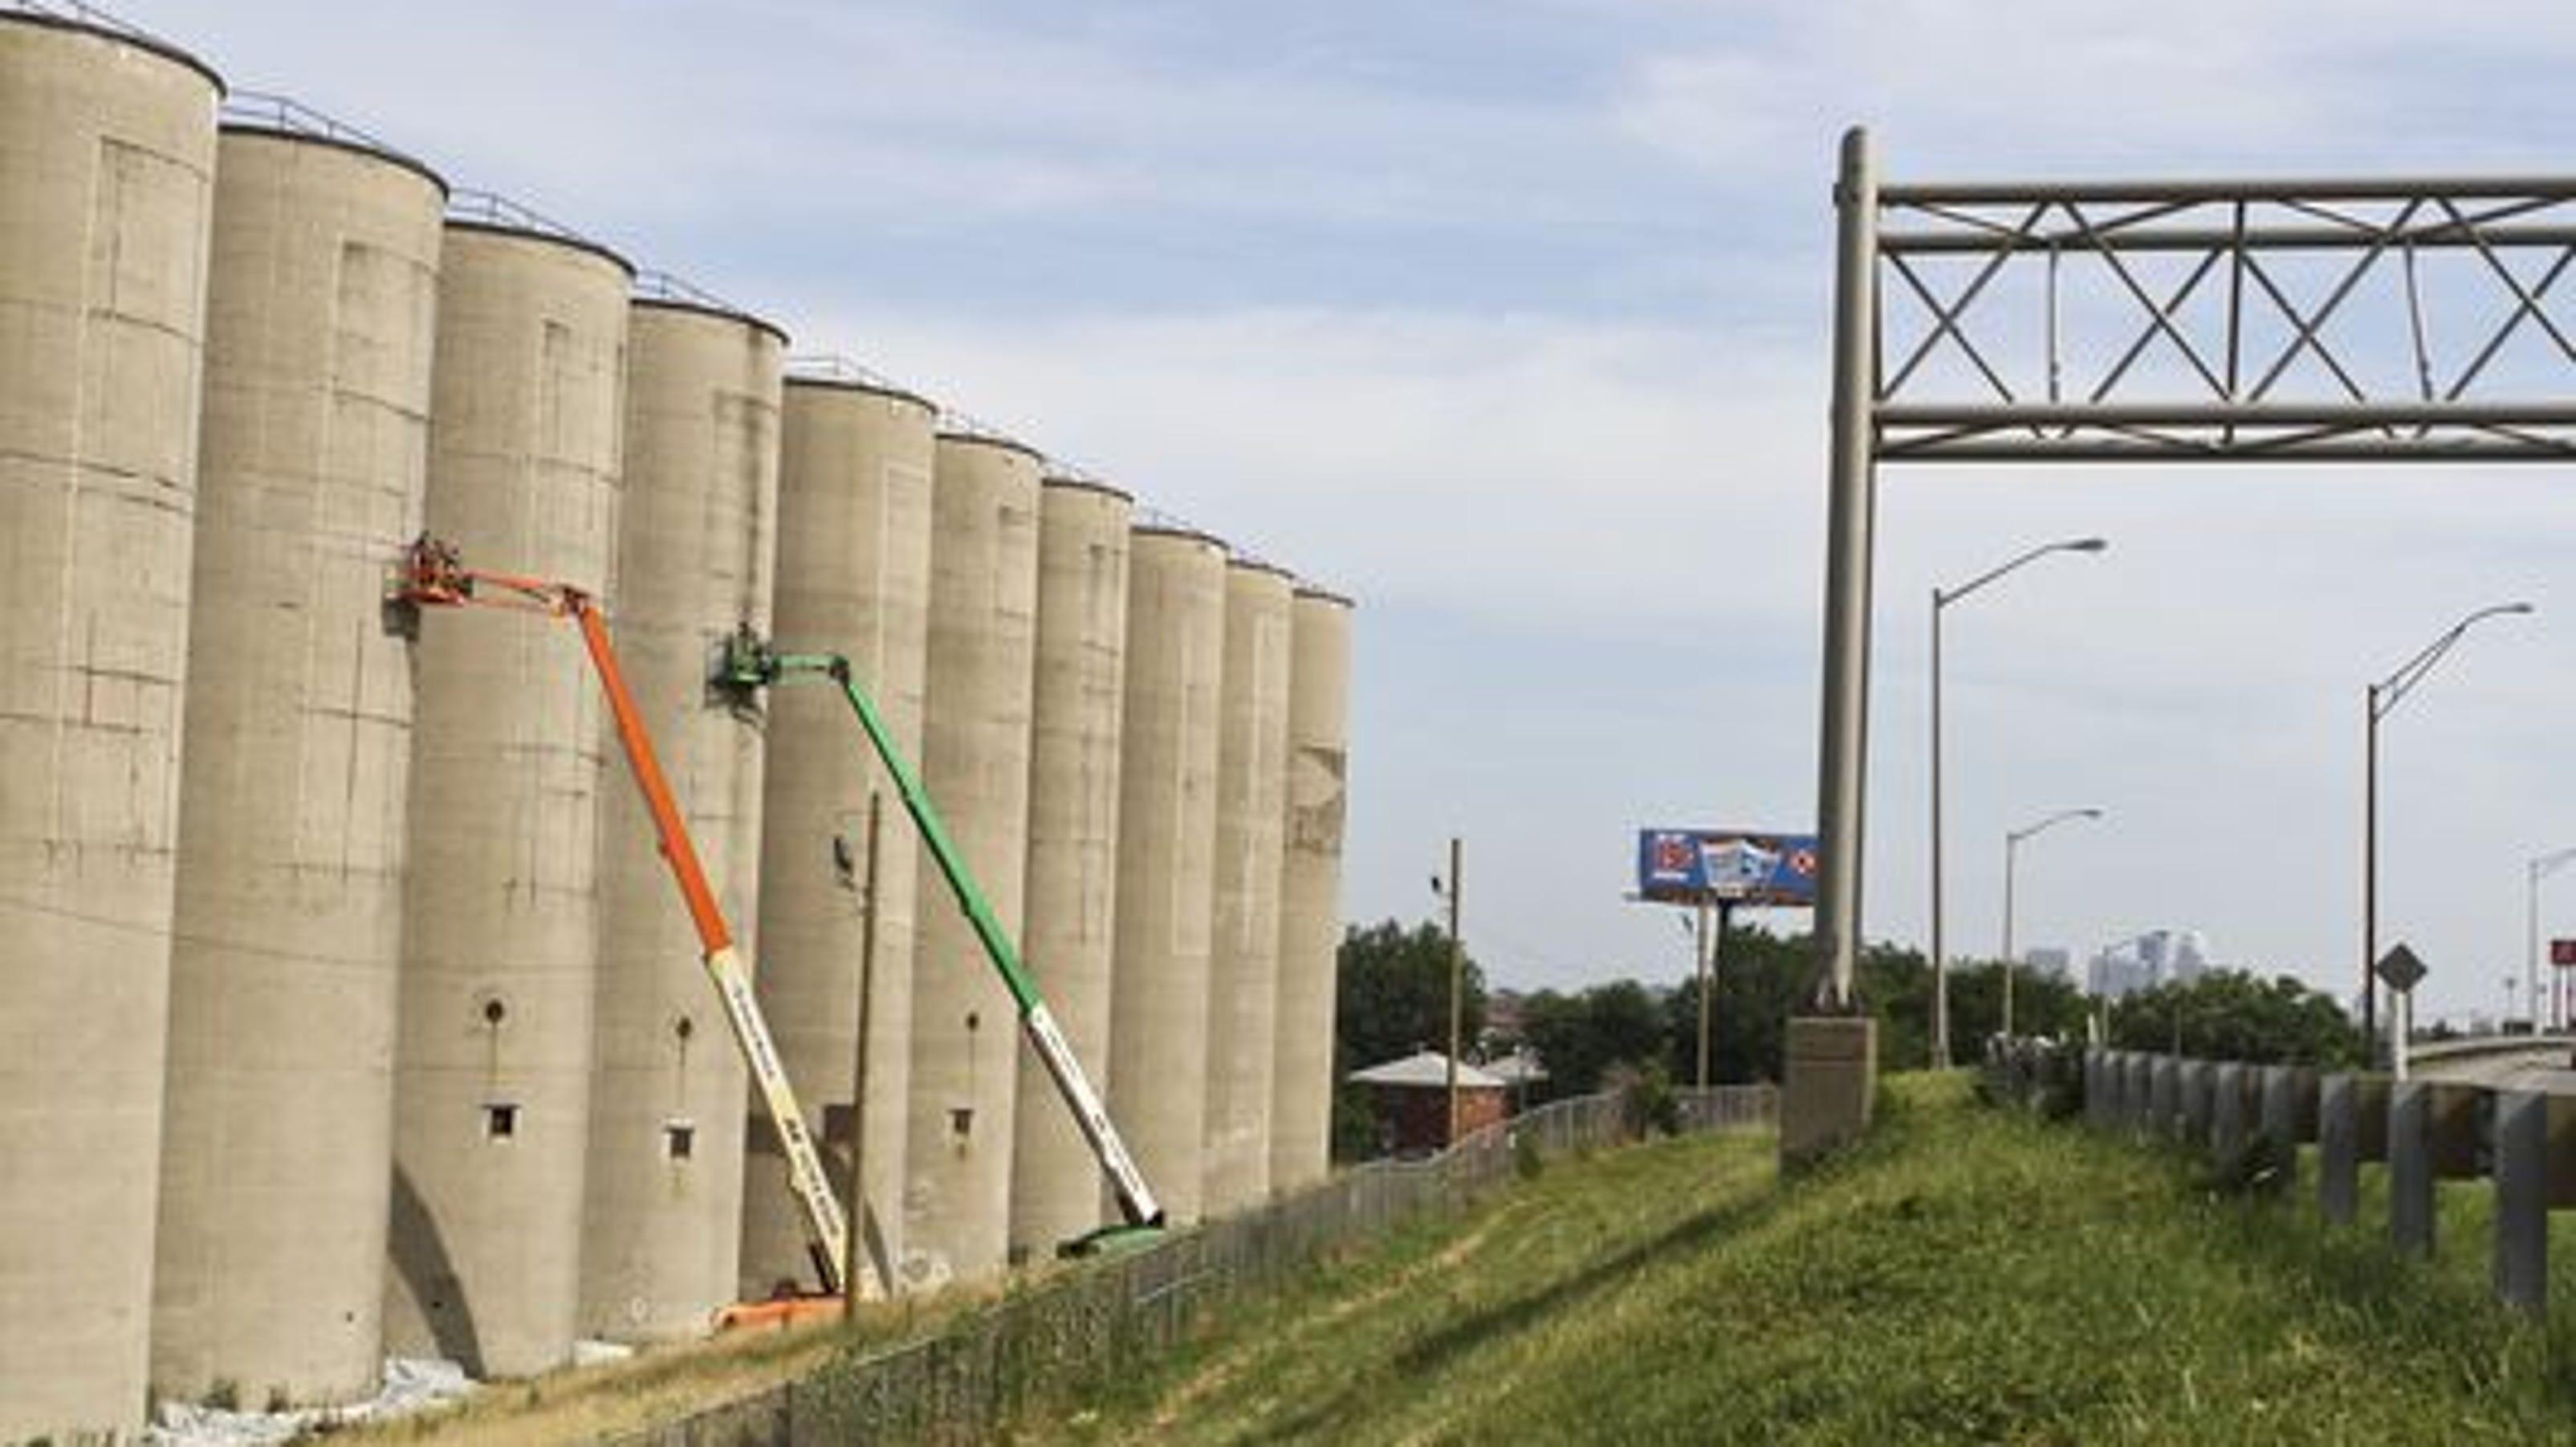 3 Silo Demolition : Uofl silo demolition later in the week